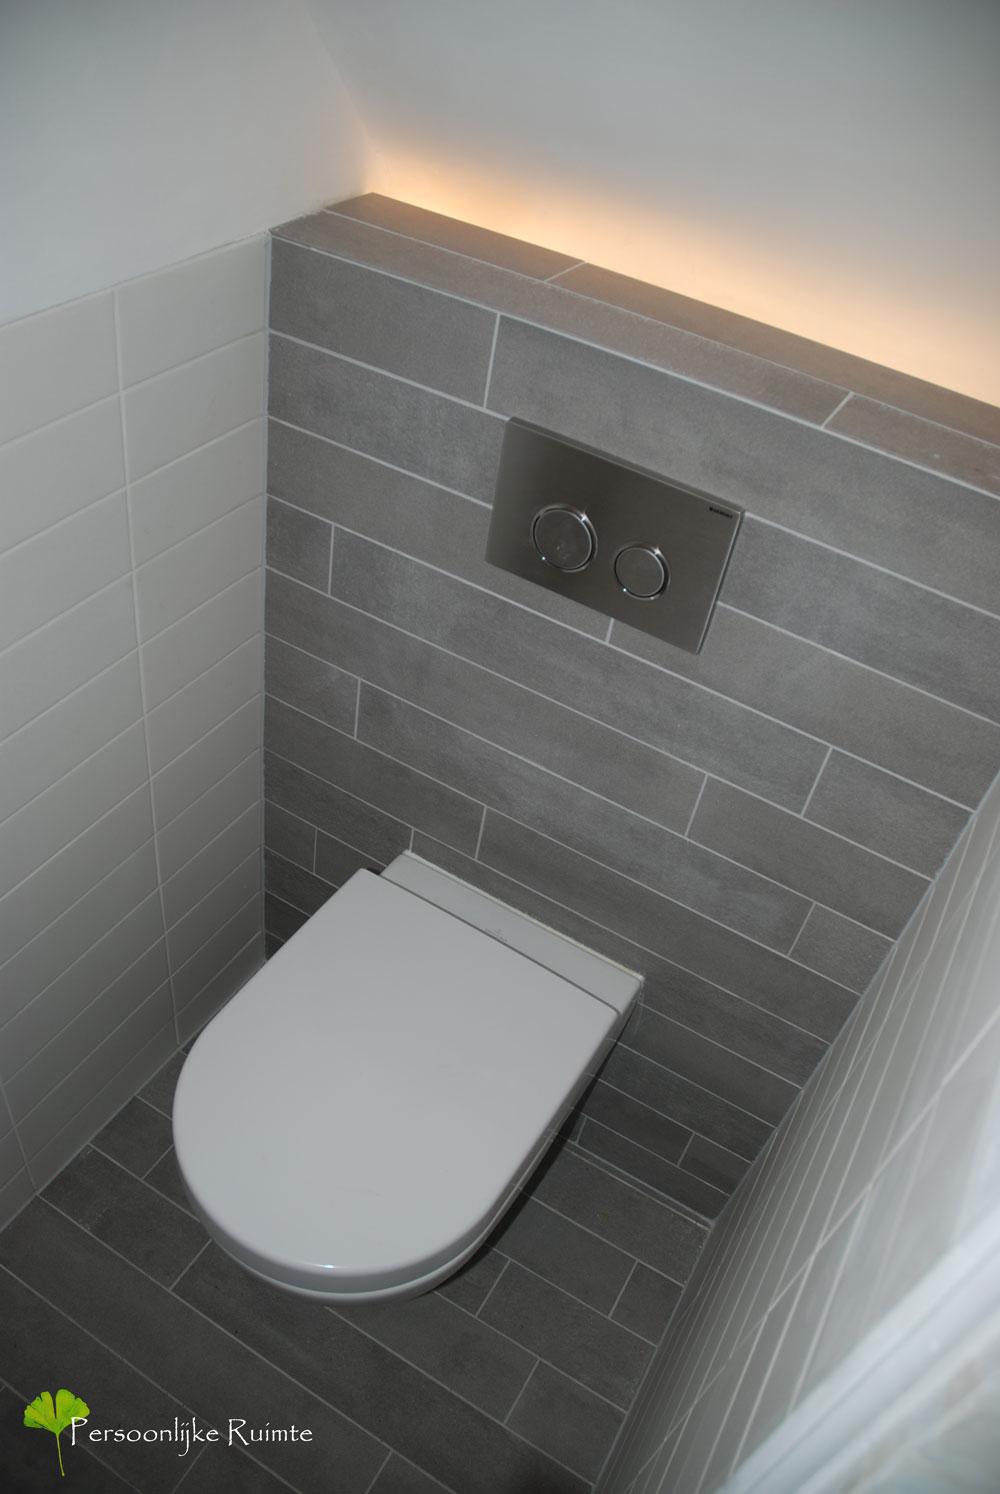 Toiletruimte persoonlijke ruimte - Wand trap ...